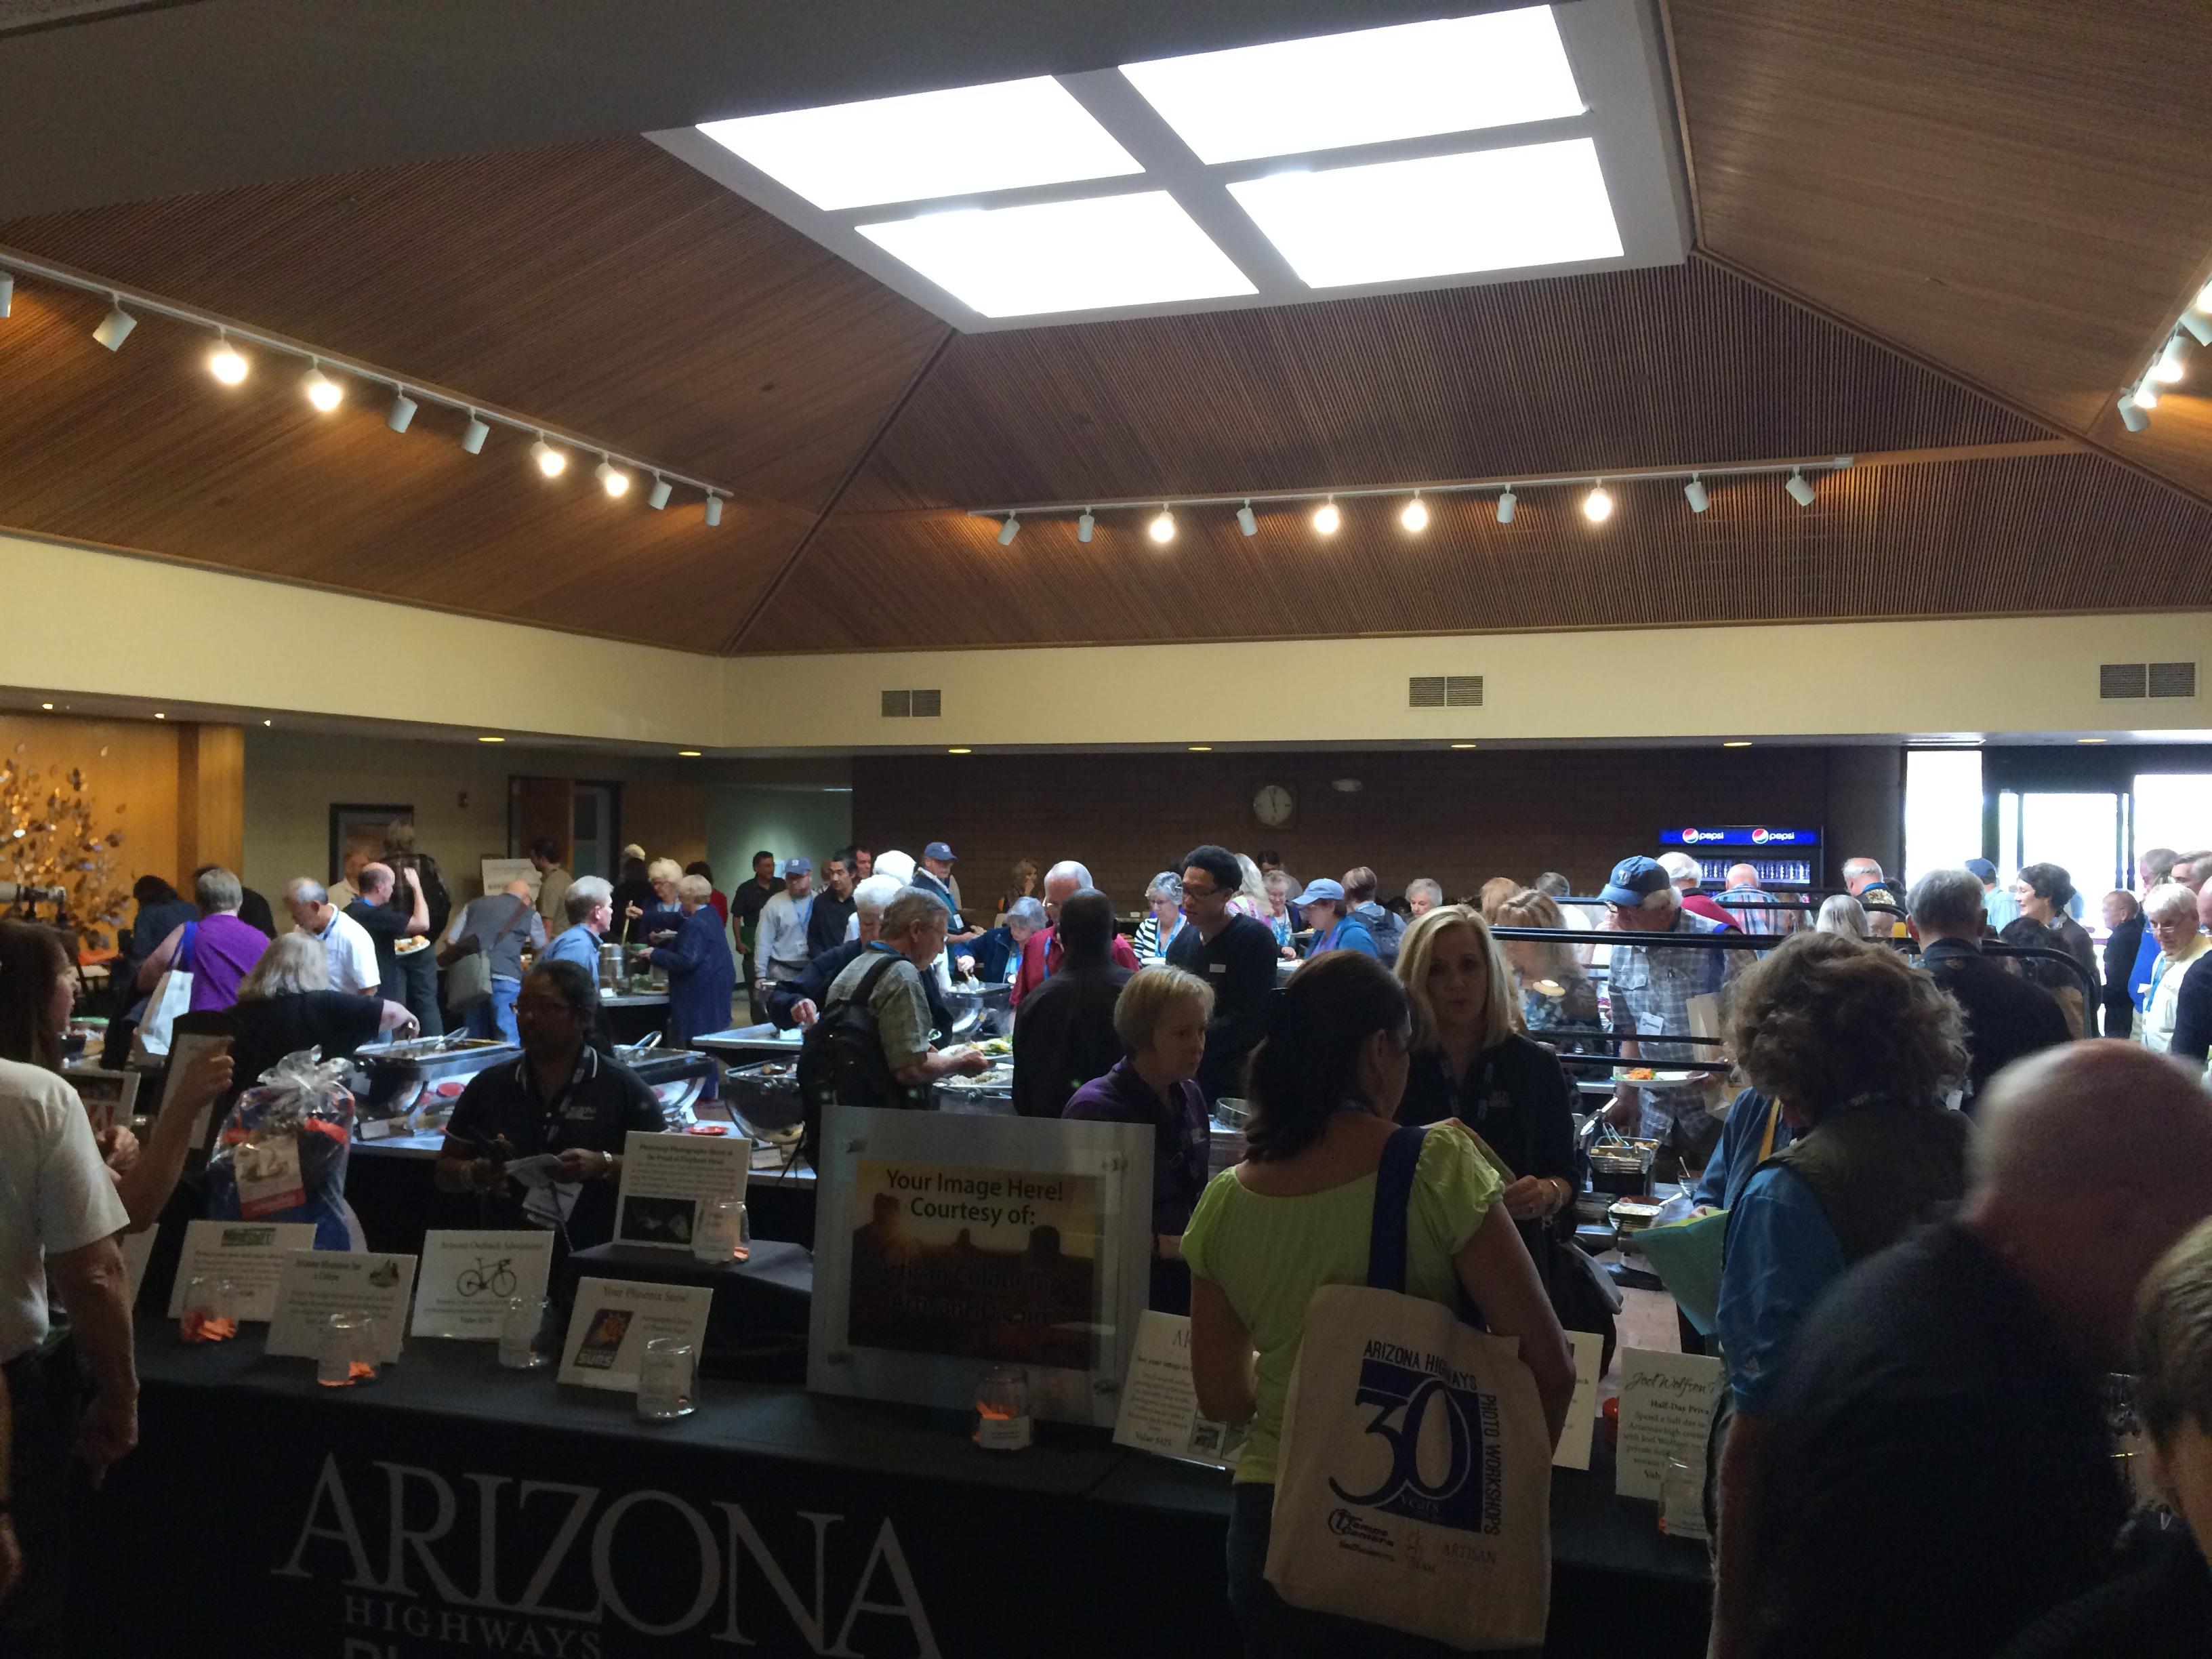 30th Photo Symposium for Arizona Highways conference